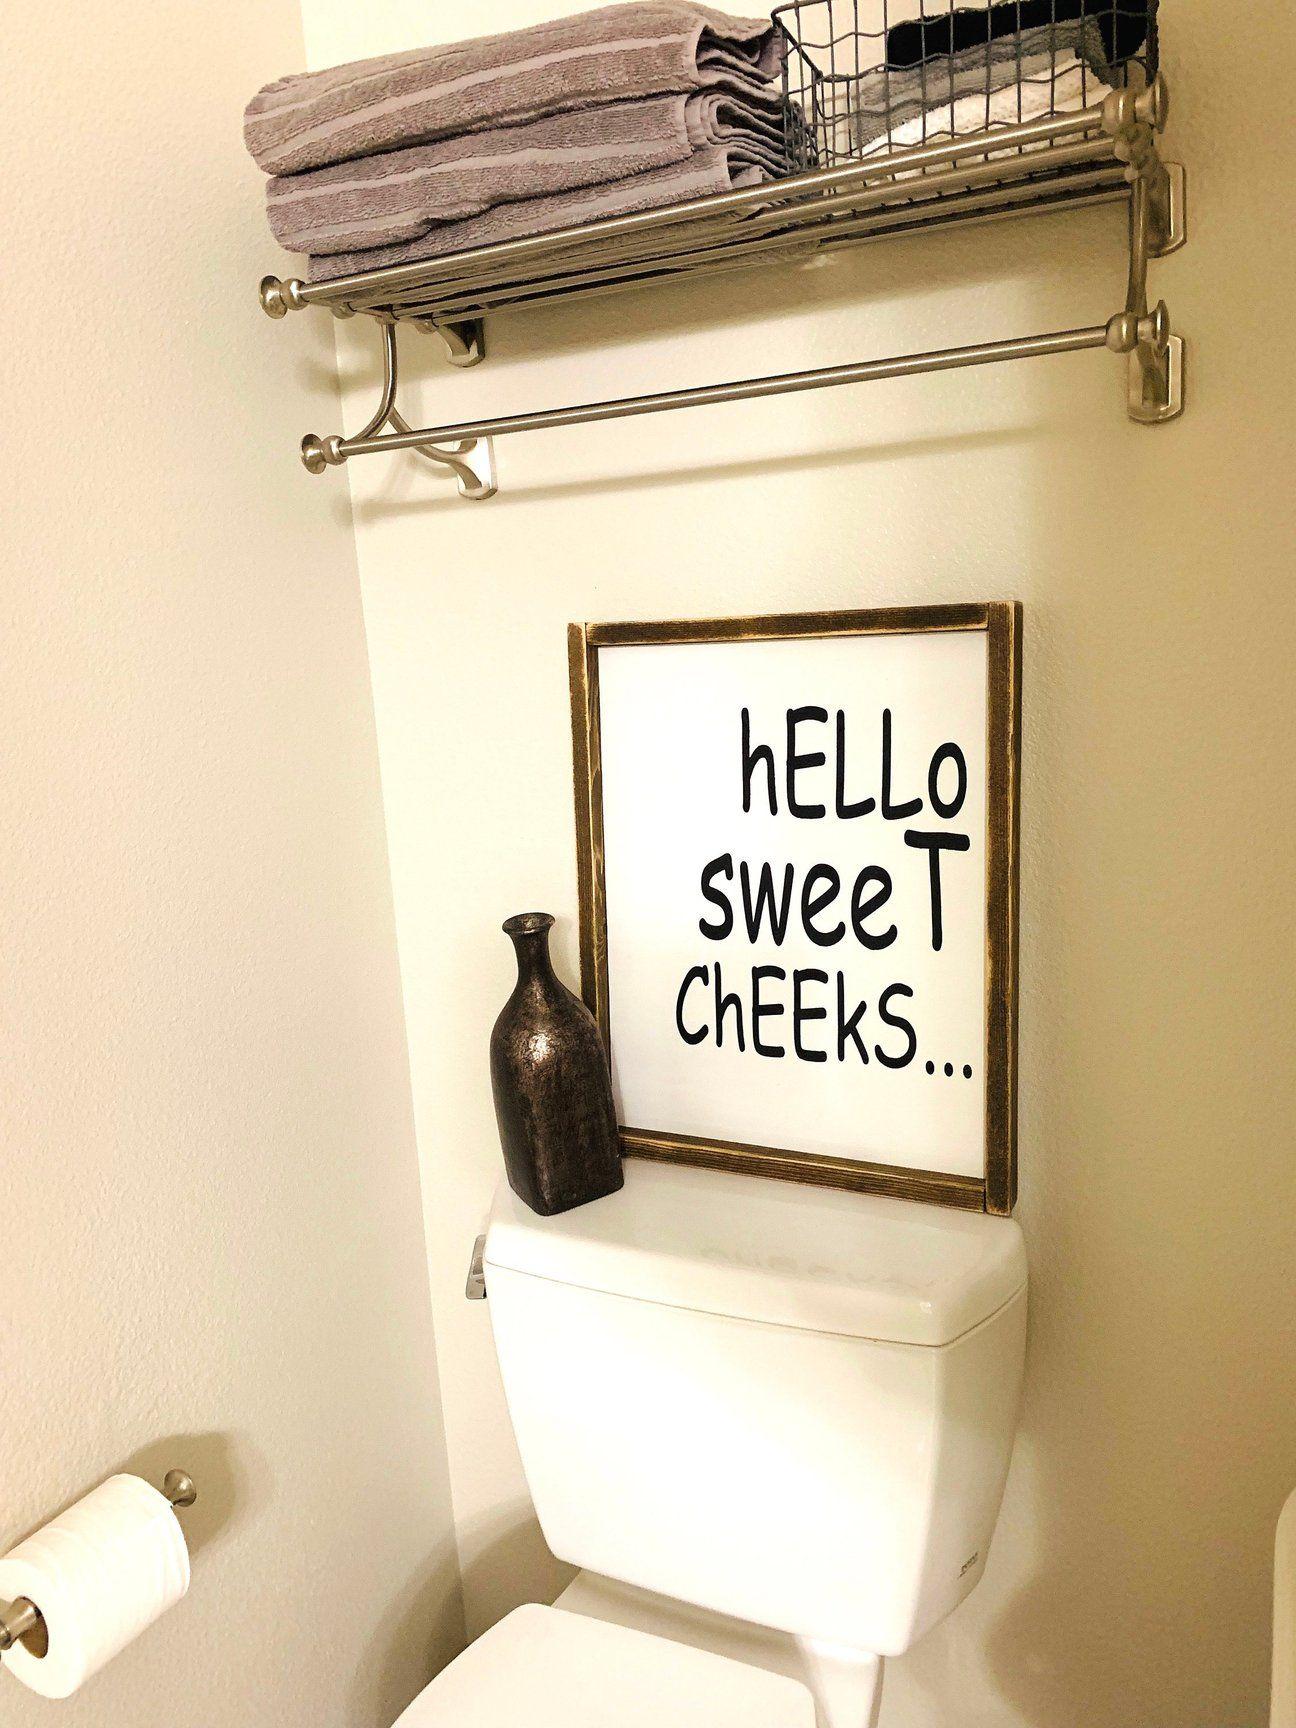 Bathroom Wall Decor Bathroom Sign Bundle Funny Bathroom Signs Funny Restroom Signs Restroom Decor Funny Bathroom Signs Restroom Decor Bathroom Decor Signs